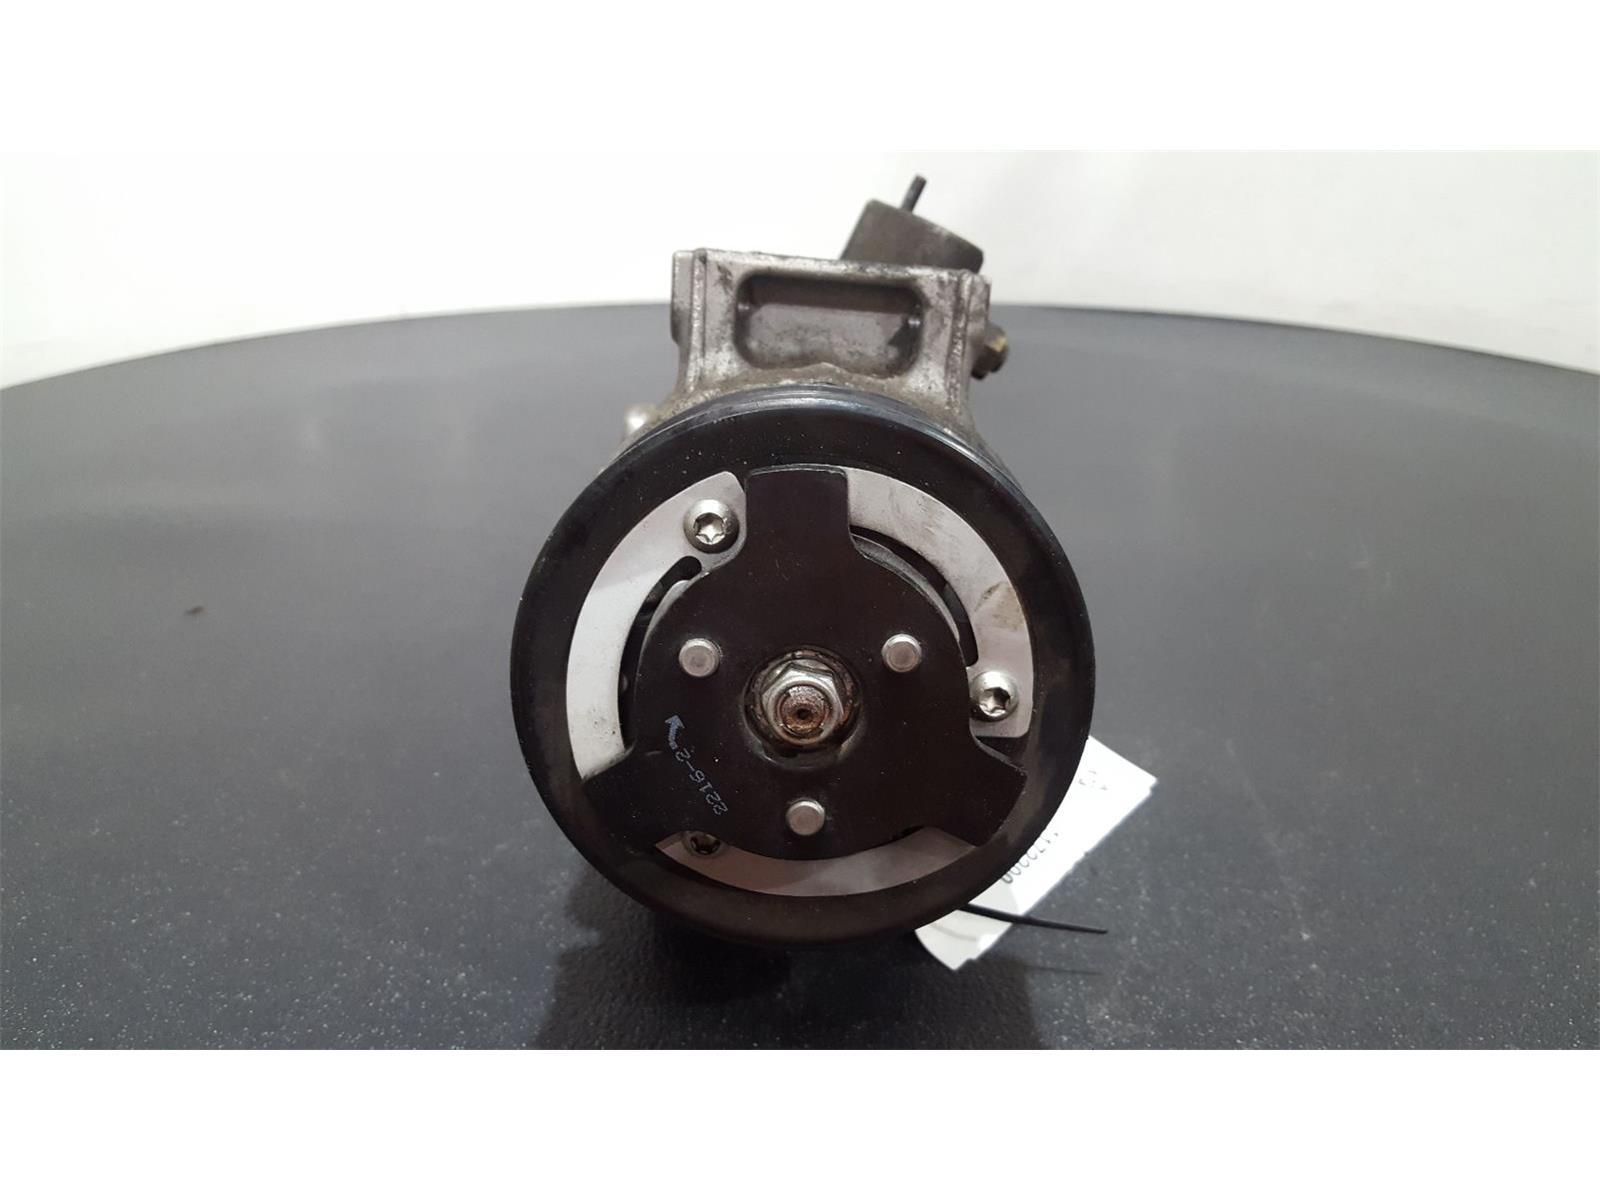 Skoda Fabia 2010 To 2014 1.2 Air Conditioning Pump 5N0820803G